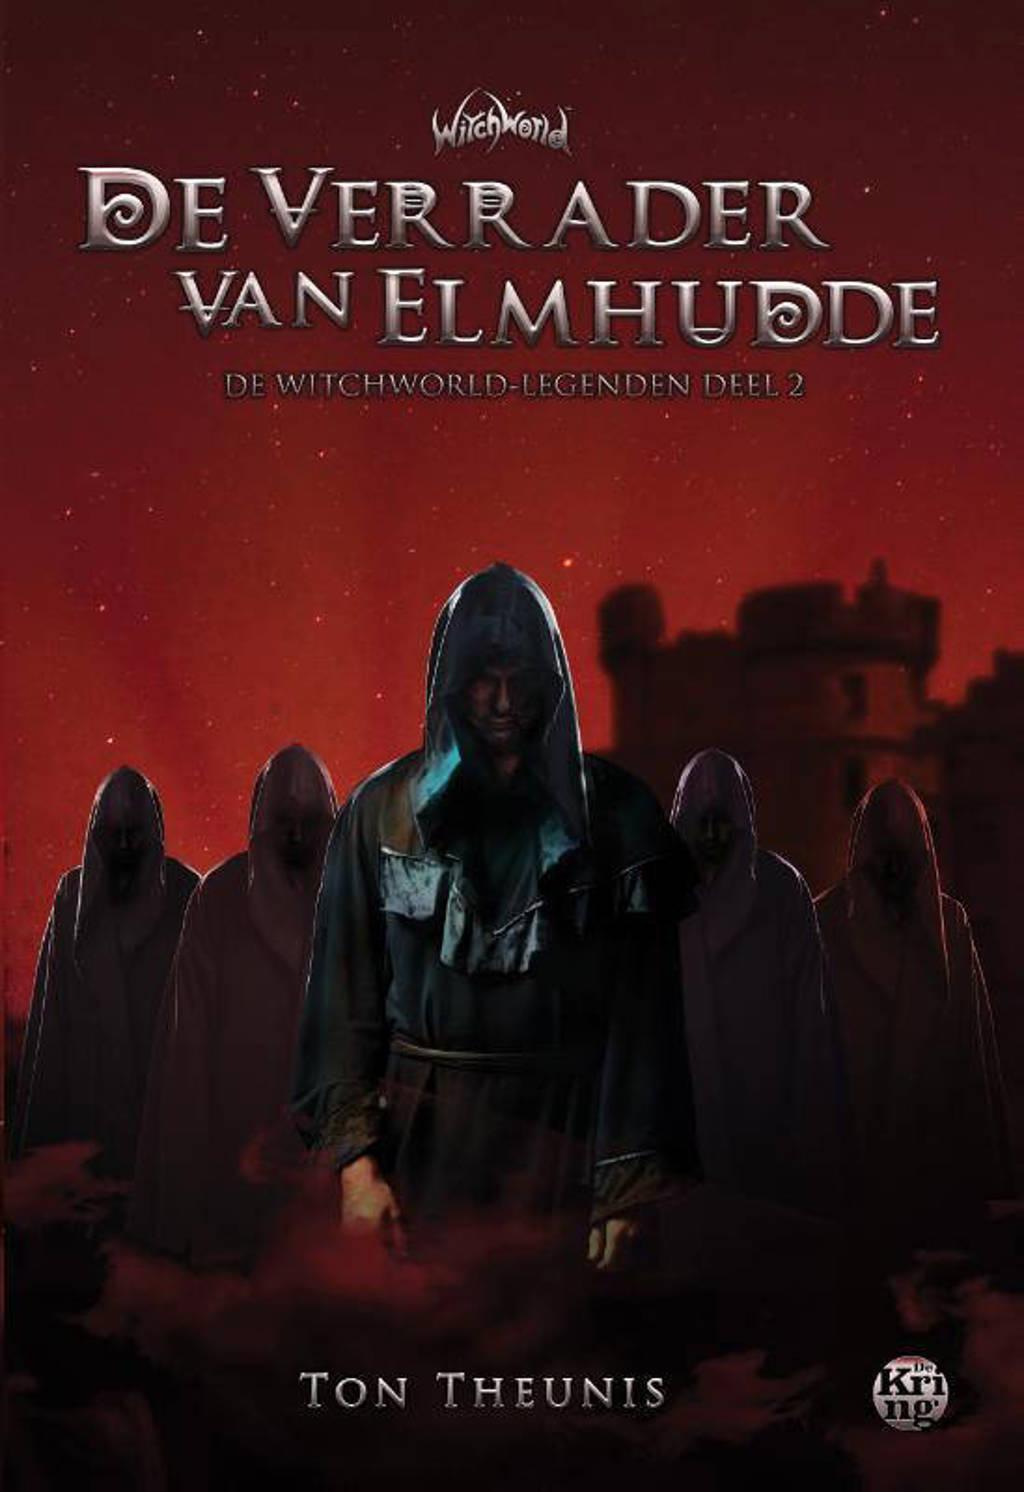 De Witchworld-legendes: De verrader van Elmhudde - Ton Theunis